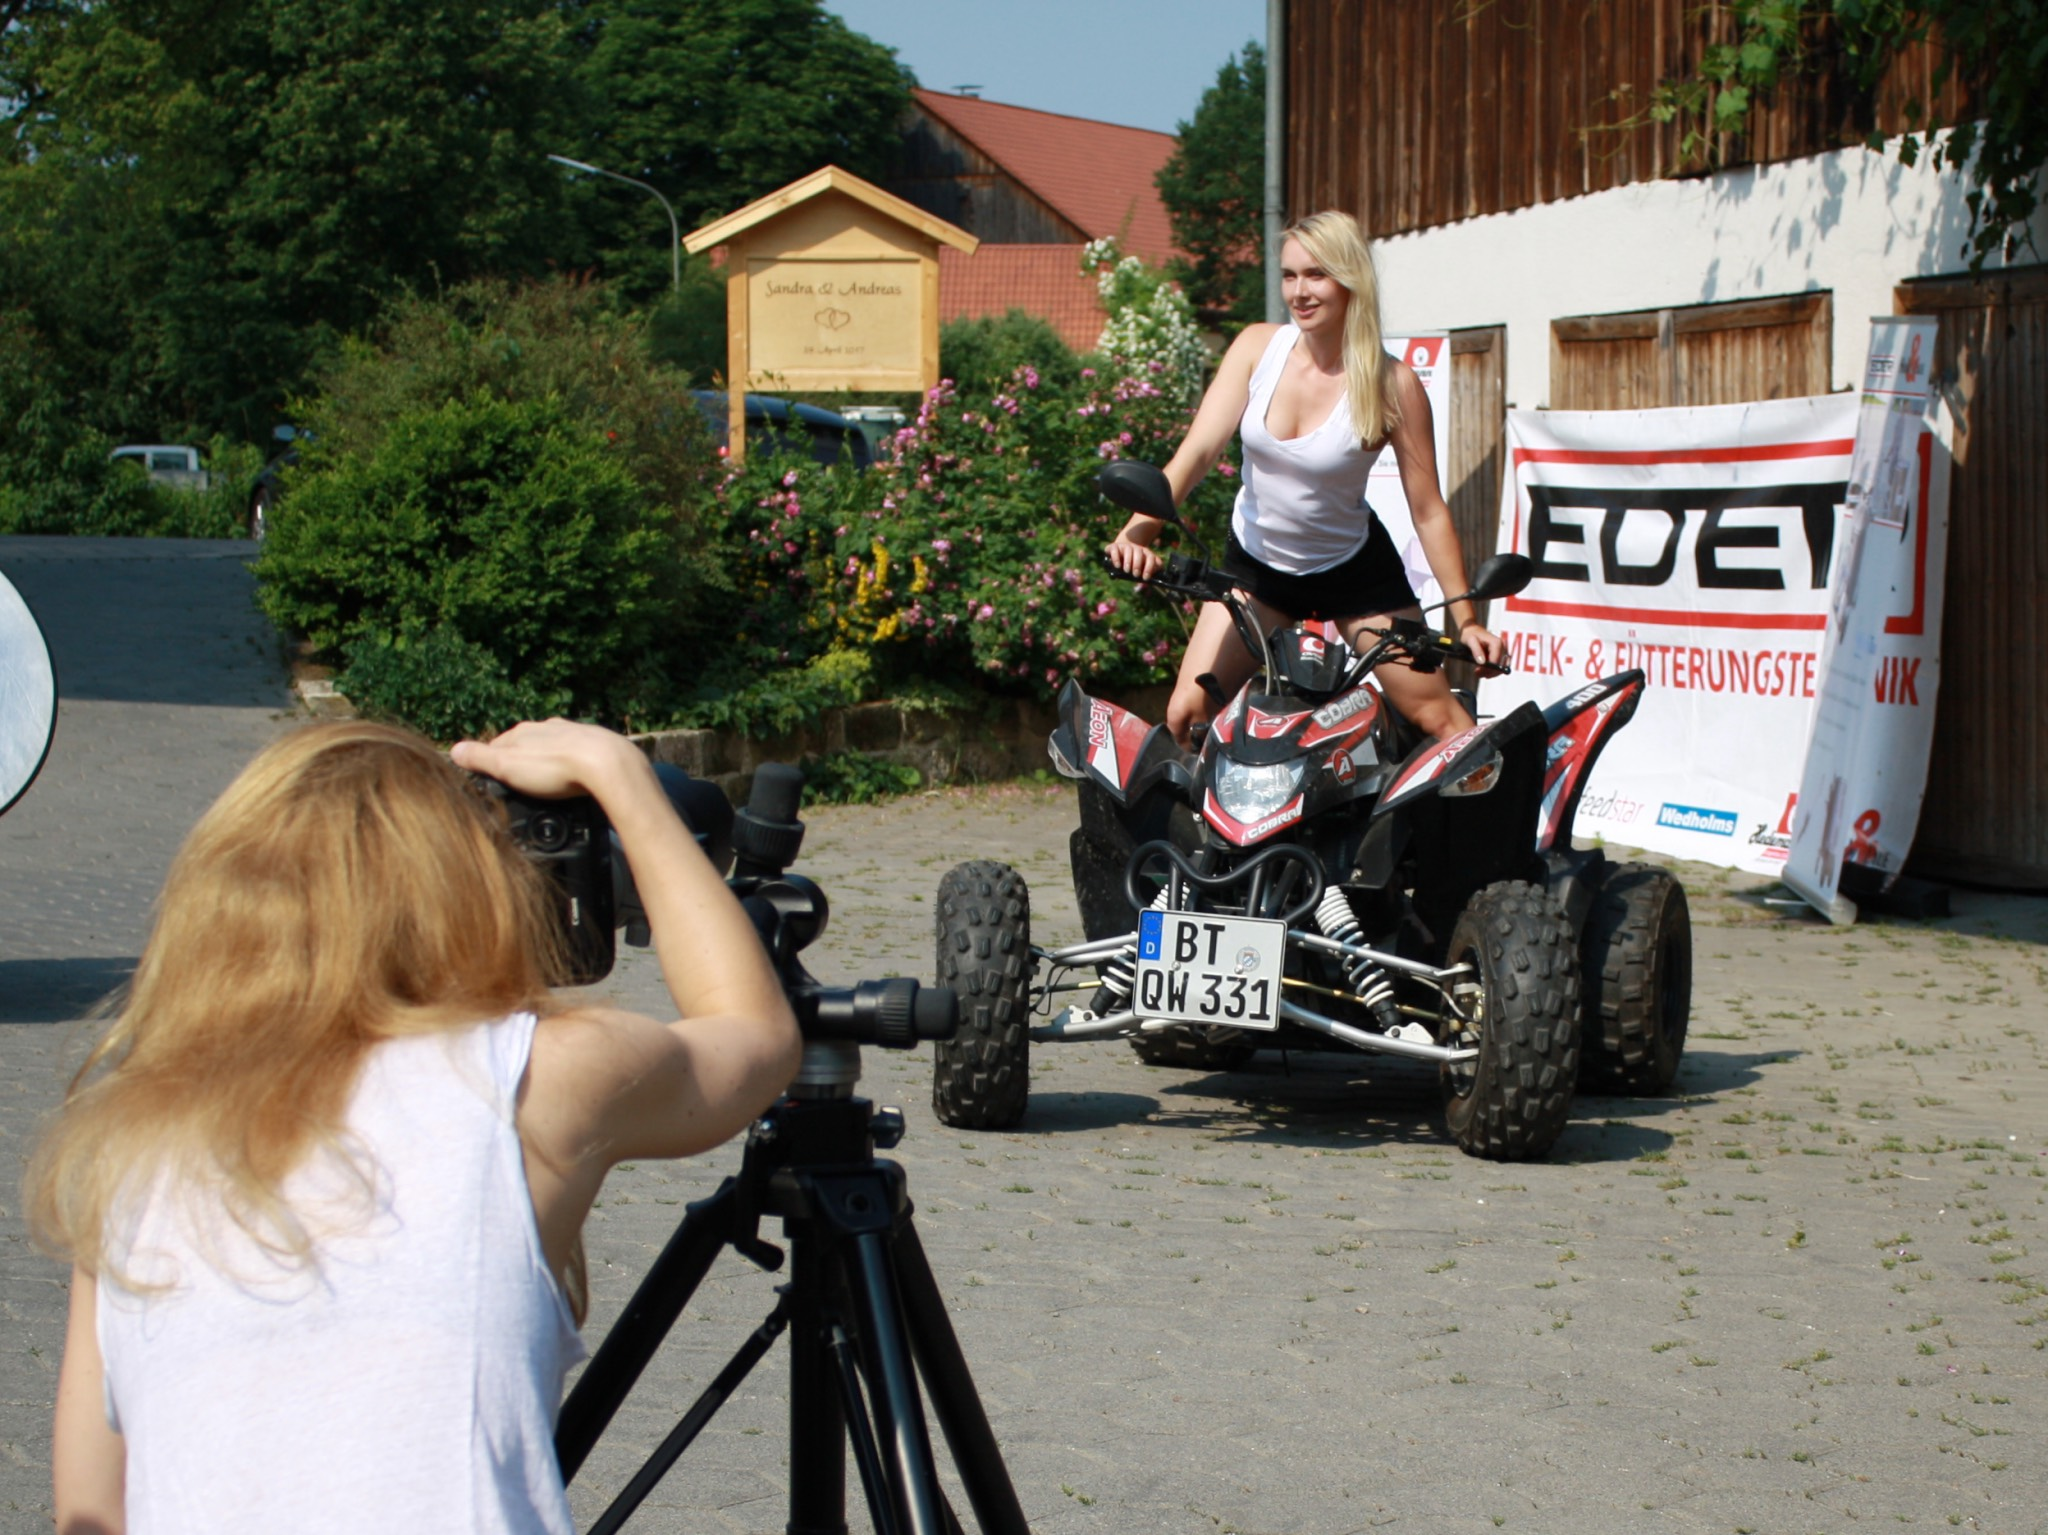 Szene vom Shooting des diesjährigen Kalenders: Foto: AGRO Communication GmbH